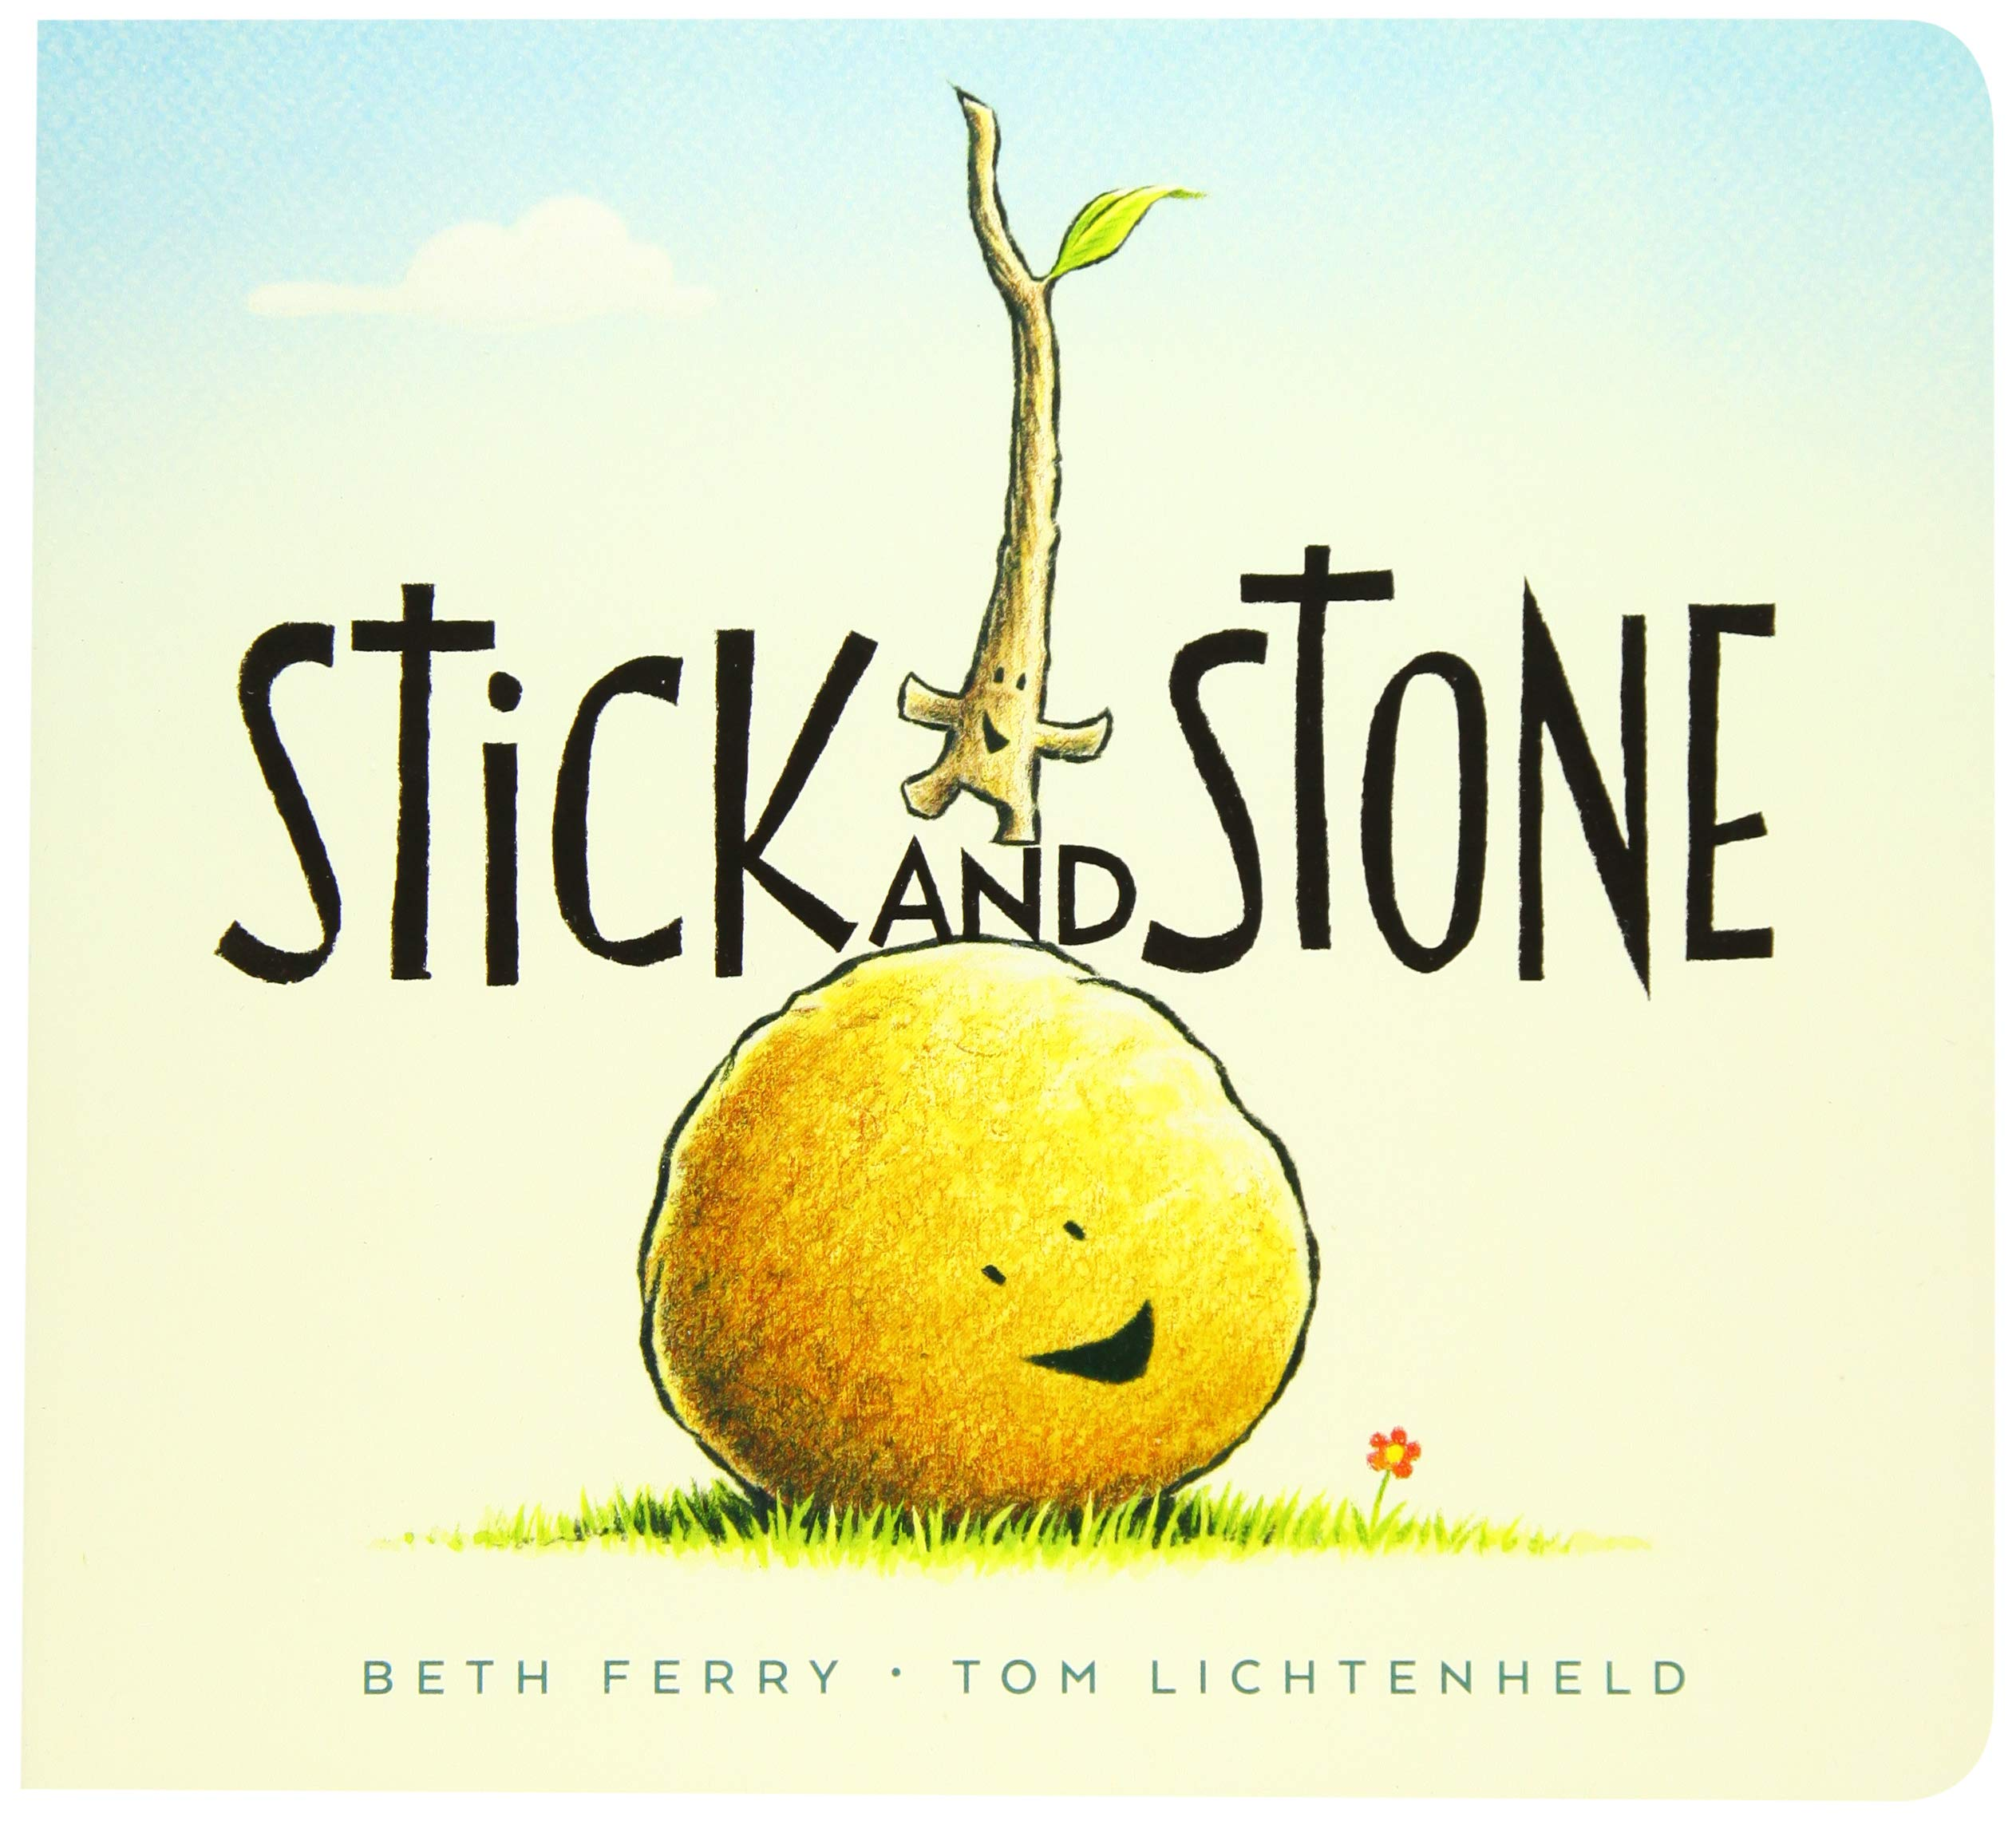 Stick and Stone (board book): Ferry, Beth, Lichtenheld, Tom ...